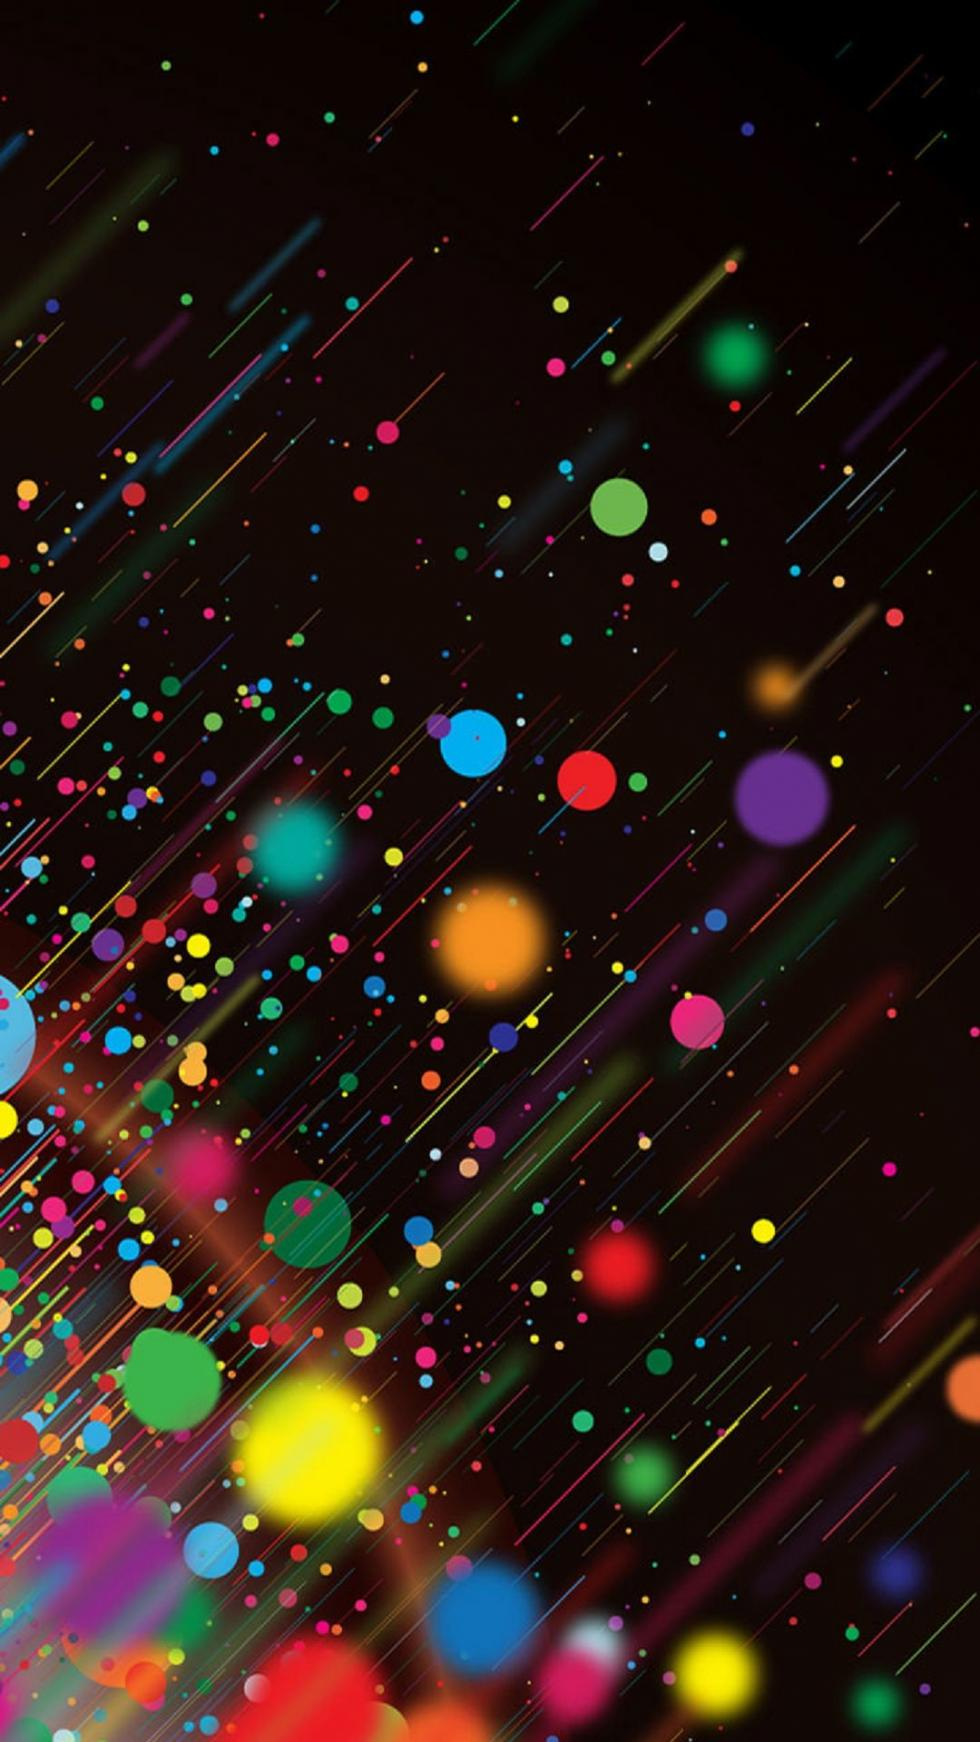 Los 50 mejores fondos de pantalla o wallpapers para for Fondos celular android